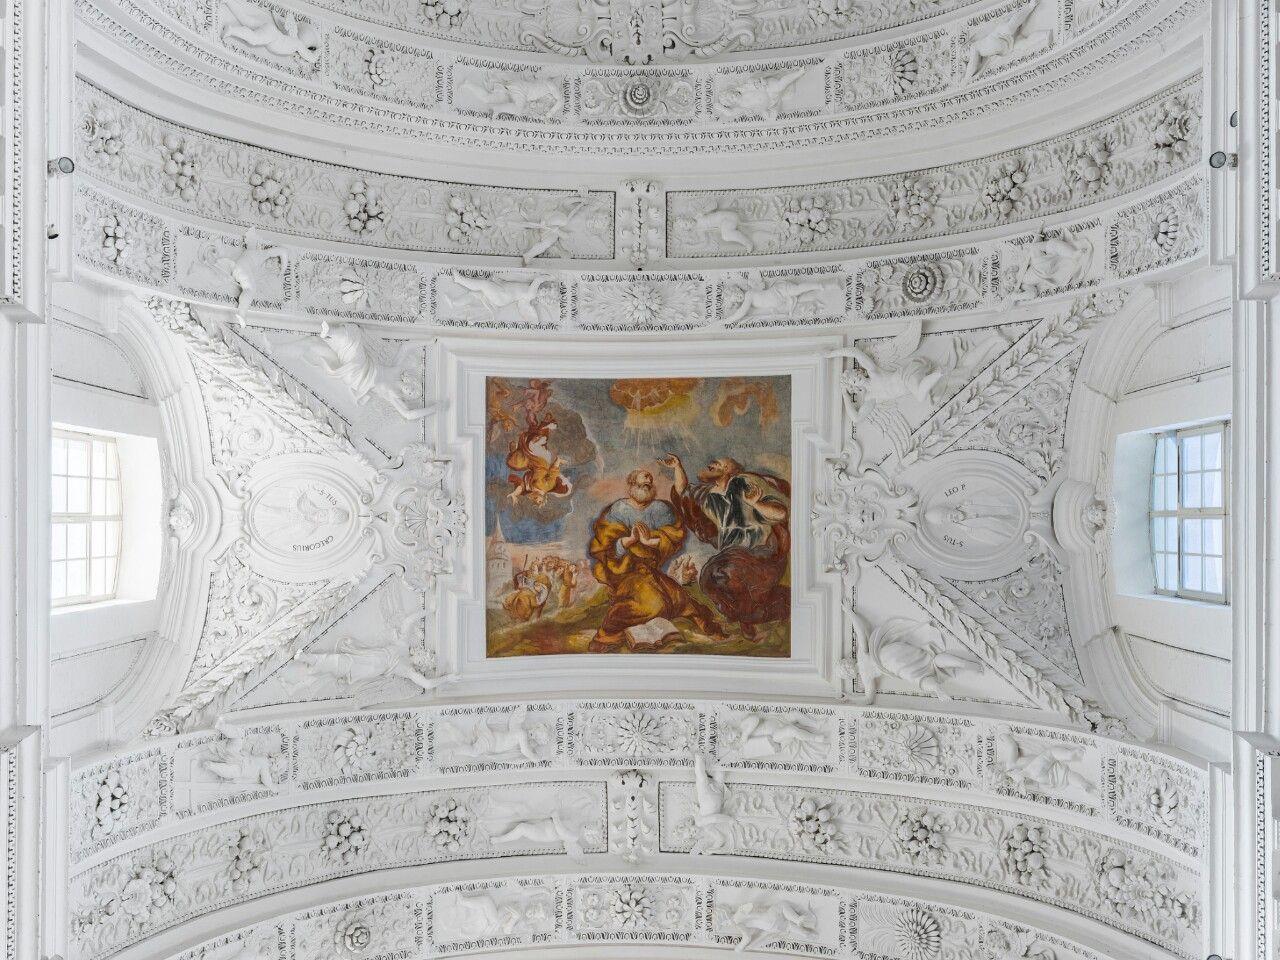 Baroque baroque art tumblr architecture celings pinterest baroque baroque art tumblr doublecrazyfo Gallery